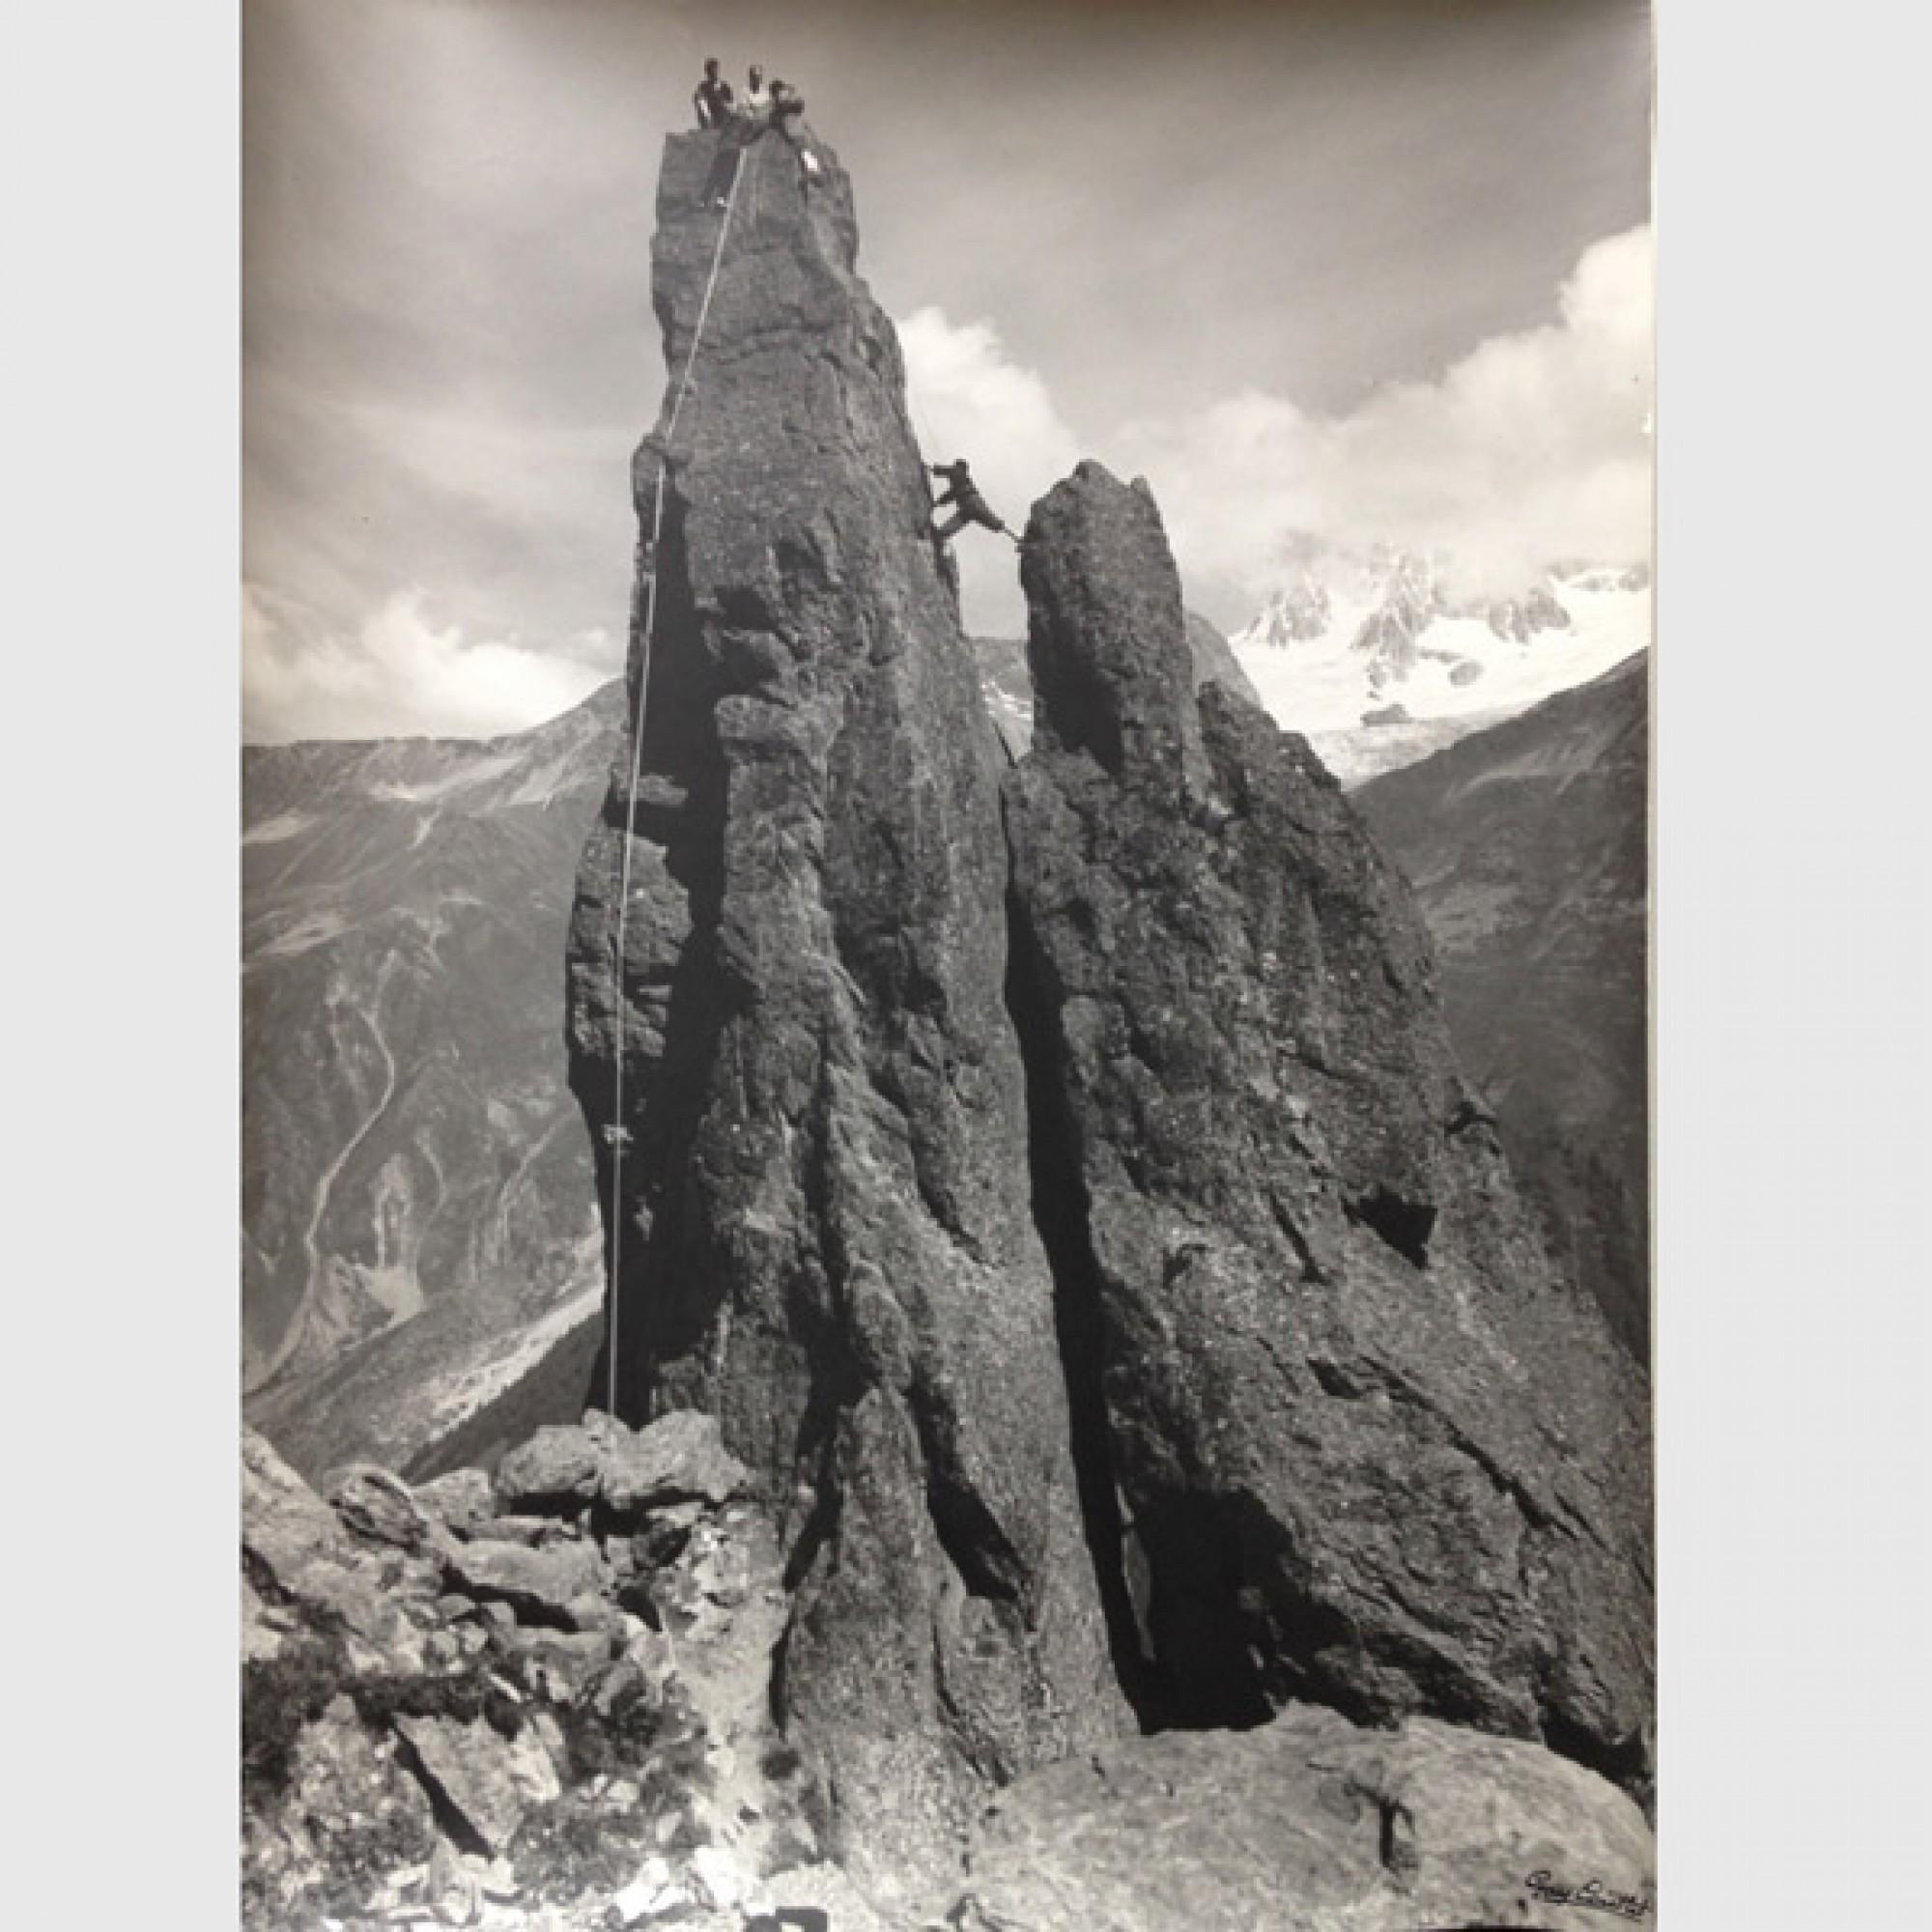 Roland Gay-Couttet,  Aiguille d'Argentière: Kletterpartie , um 1960-1970. (Hubert  Gay-Couttet und Samuel Gay-Couttet / Stadtarchiv Chamonix Mont-Blanc,  Historische Fotothek, Nachlass Gay-Couttet)